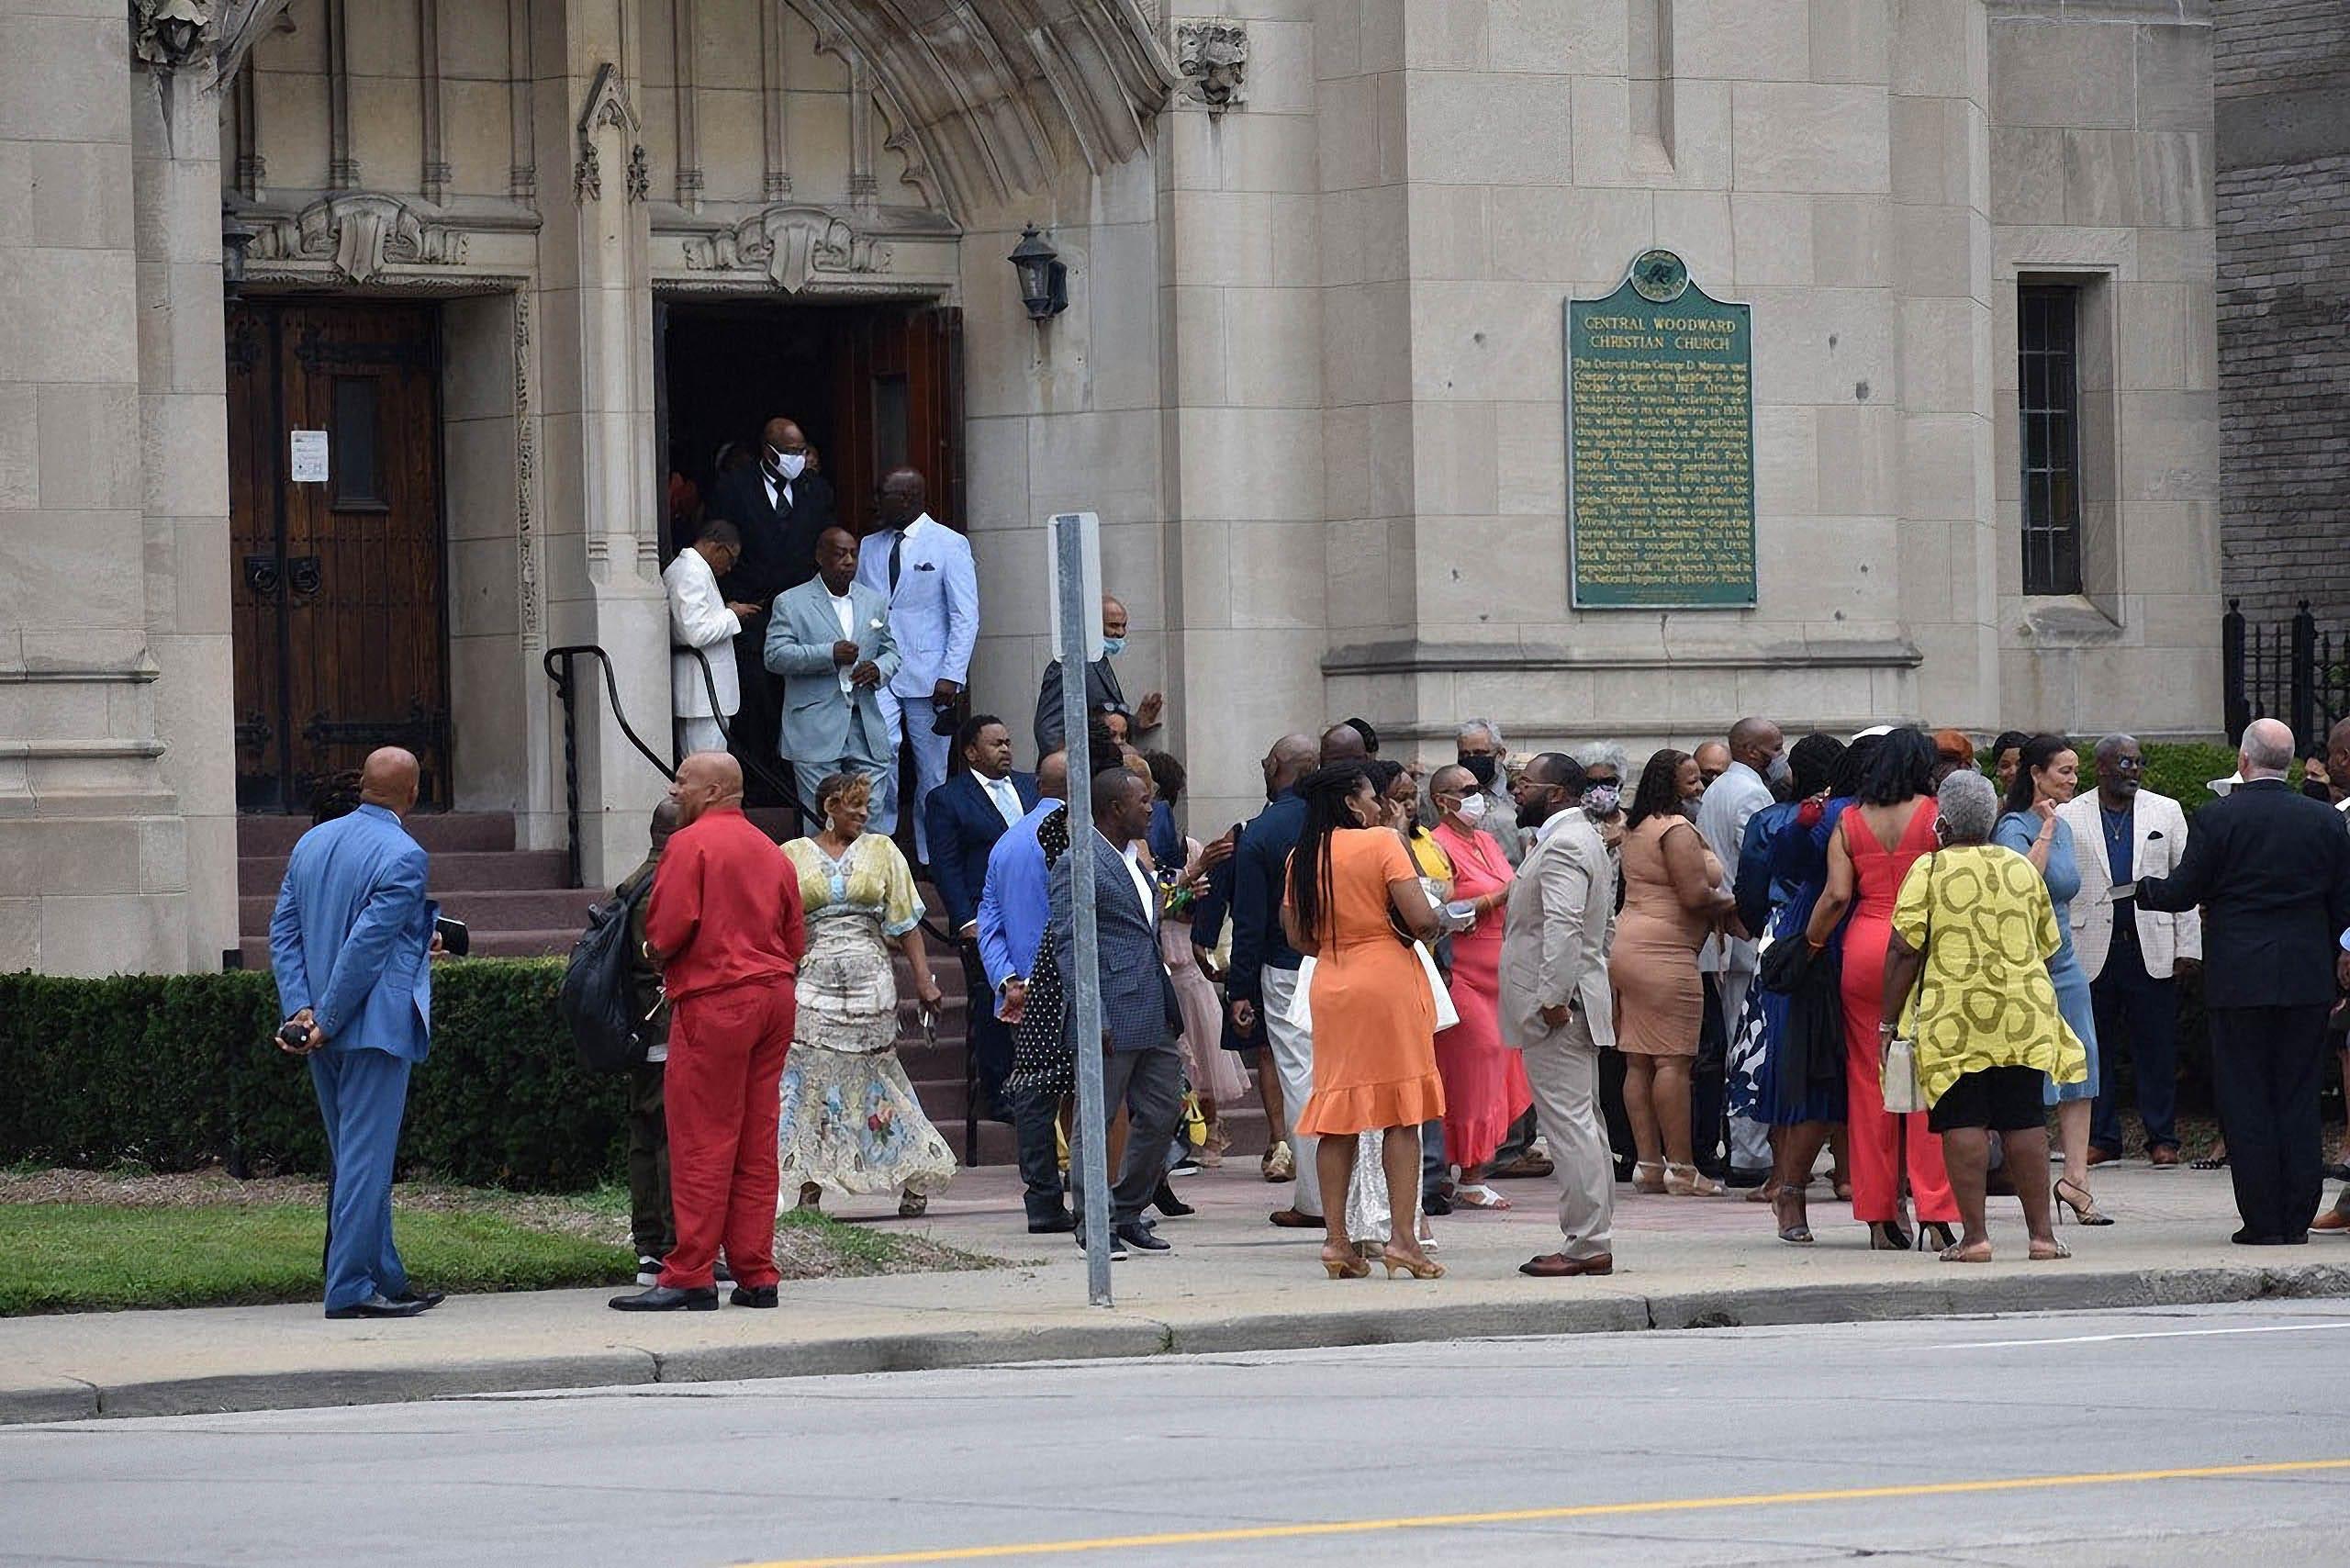 Kwame Kilpatrick marries fiancée at Little Rock Baptist Church